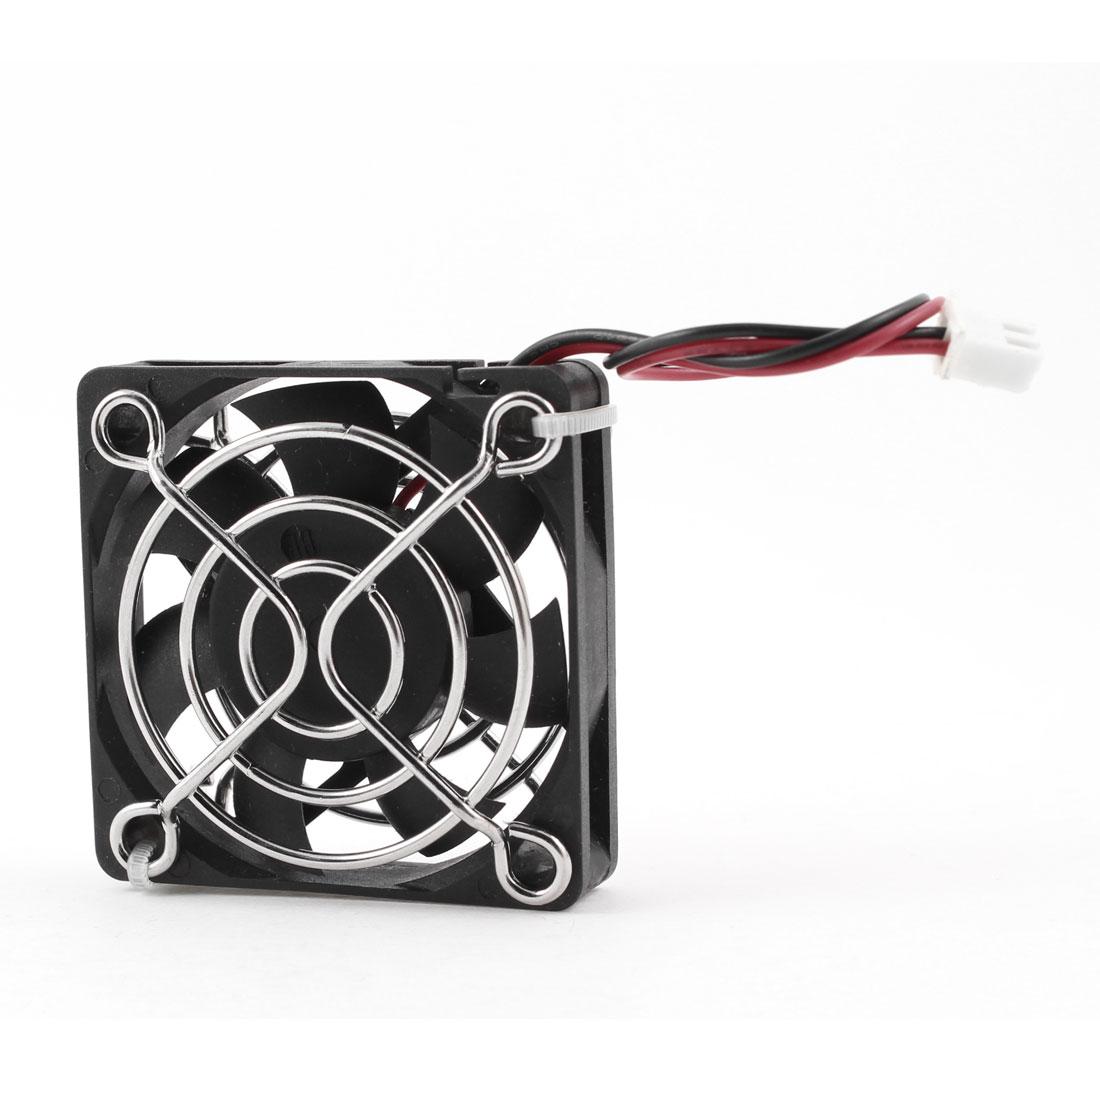 DC 12V 0.15A PC Computer Desktop CPU Cooler Cooling Fan Connector